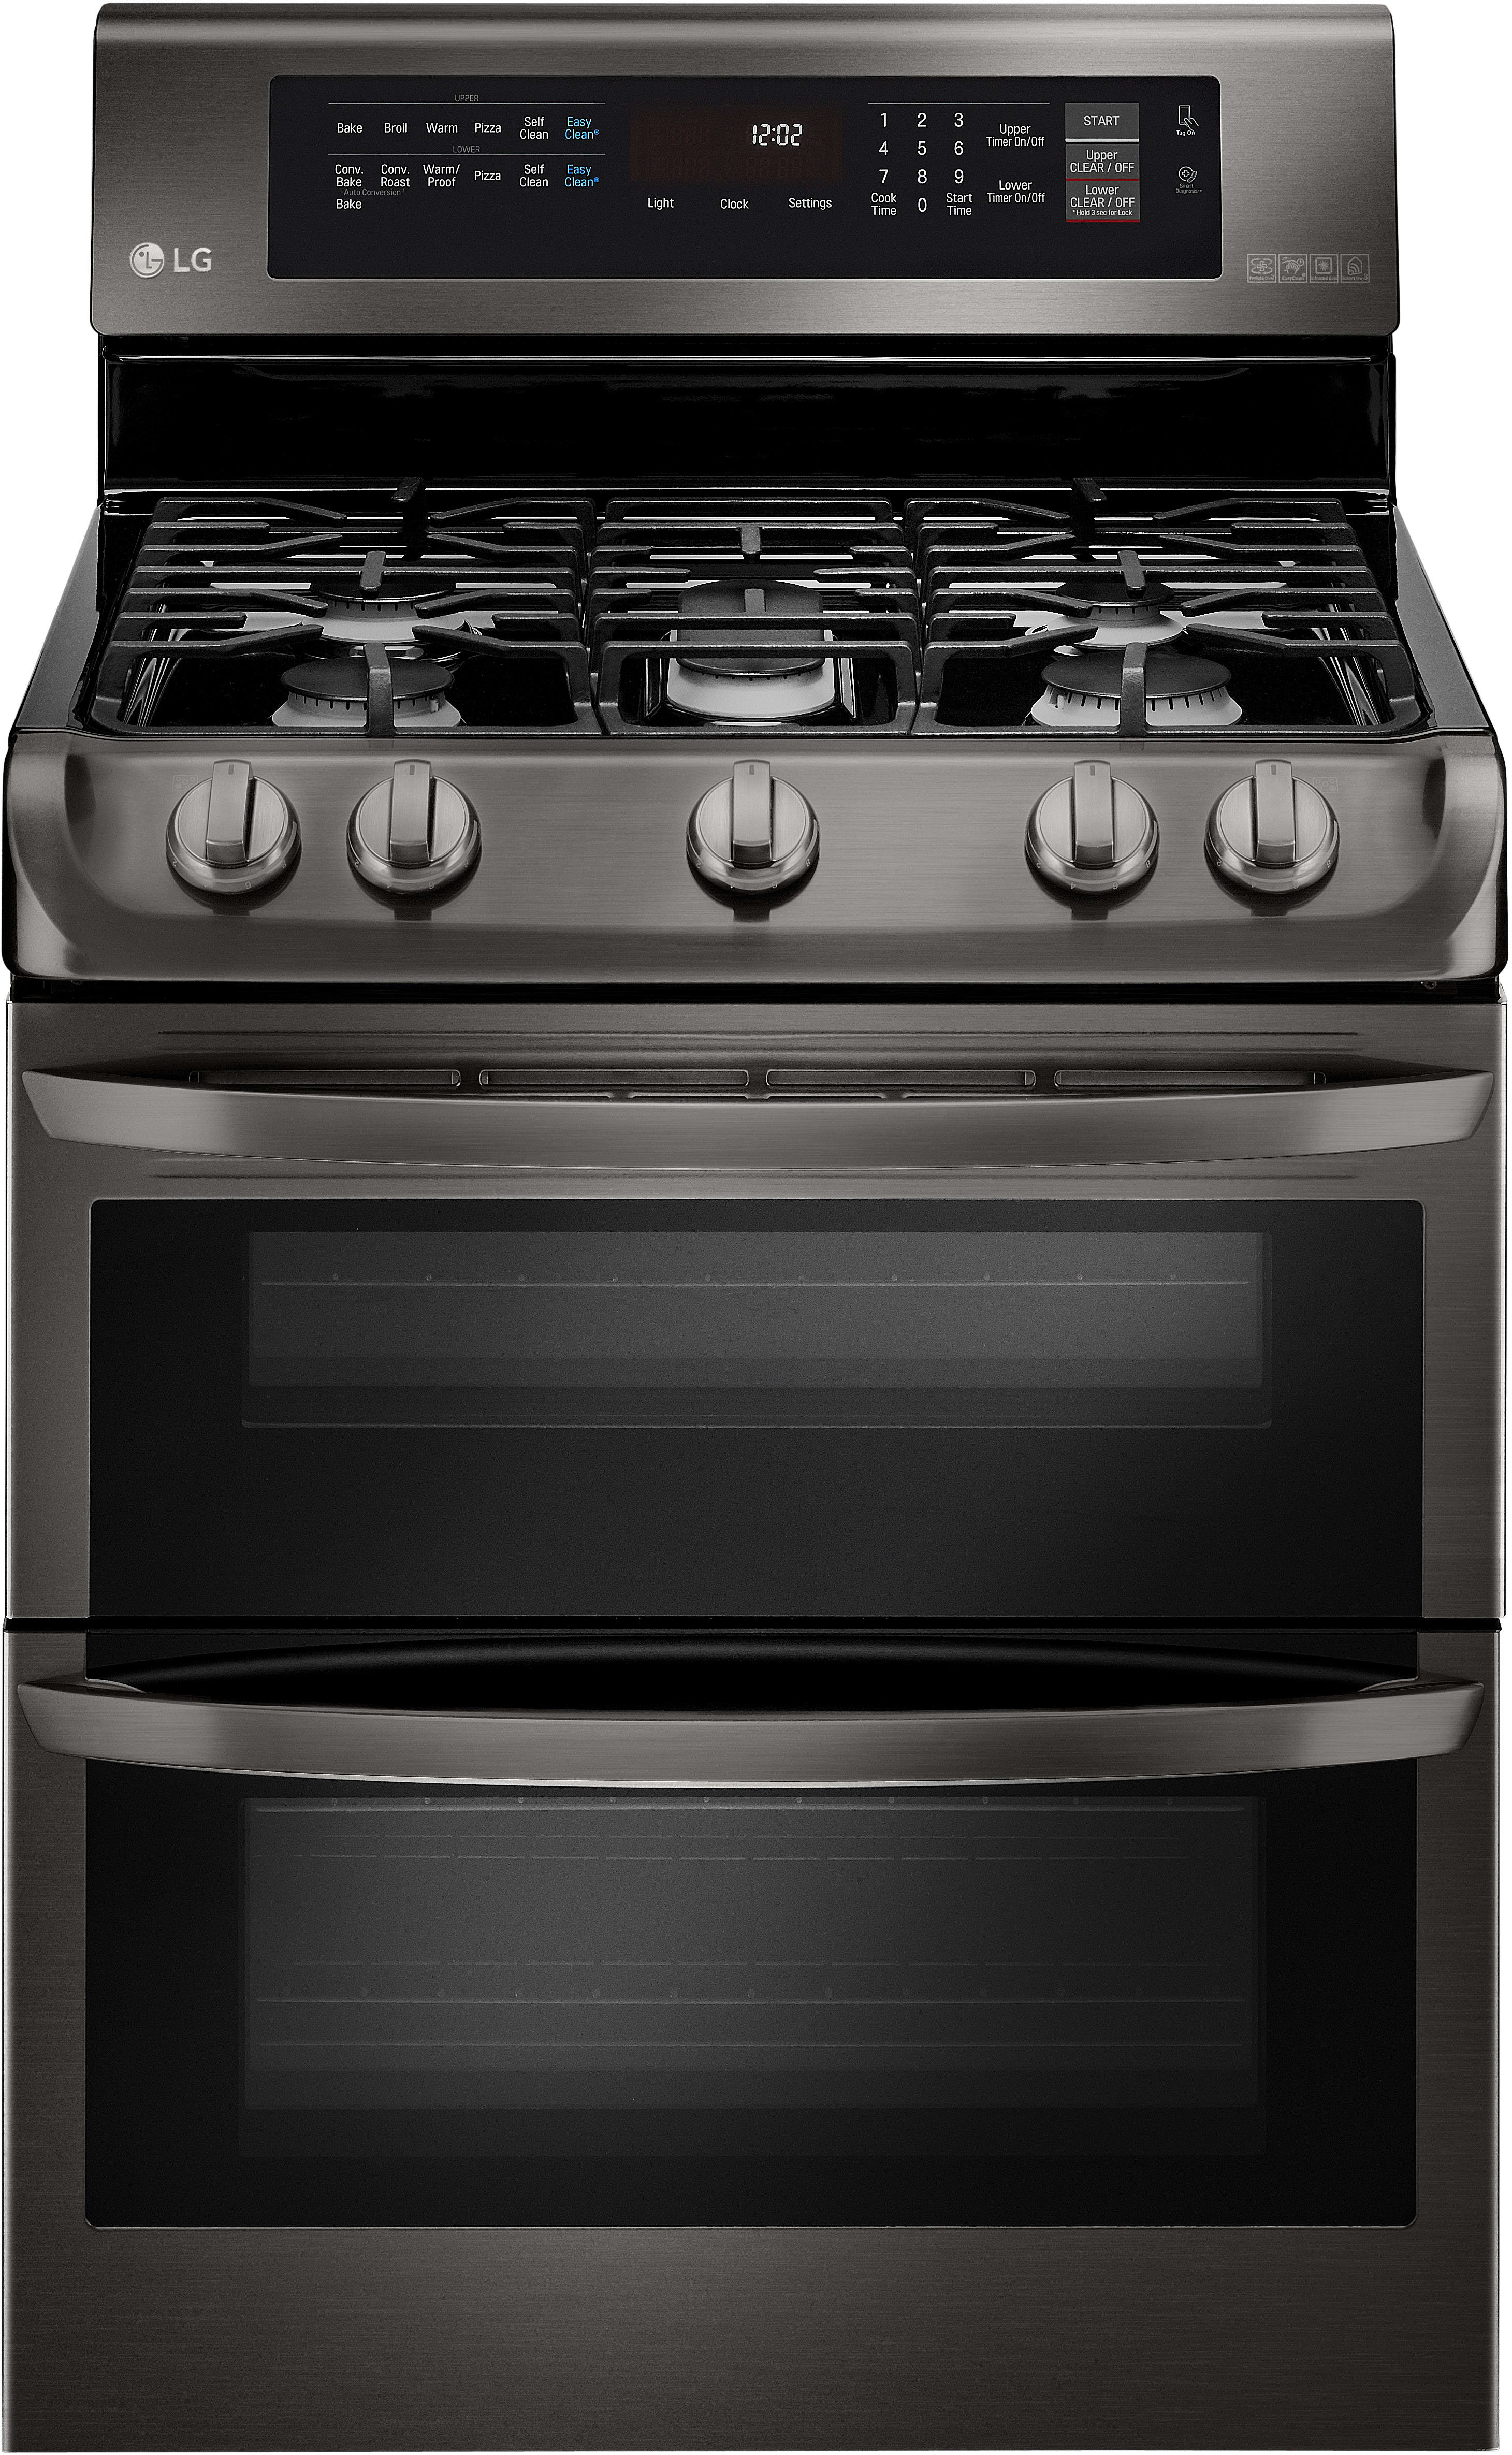 Lg Ldg4315 30 Inch Double Oven Gas Range With Probake